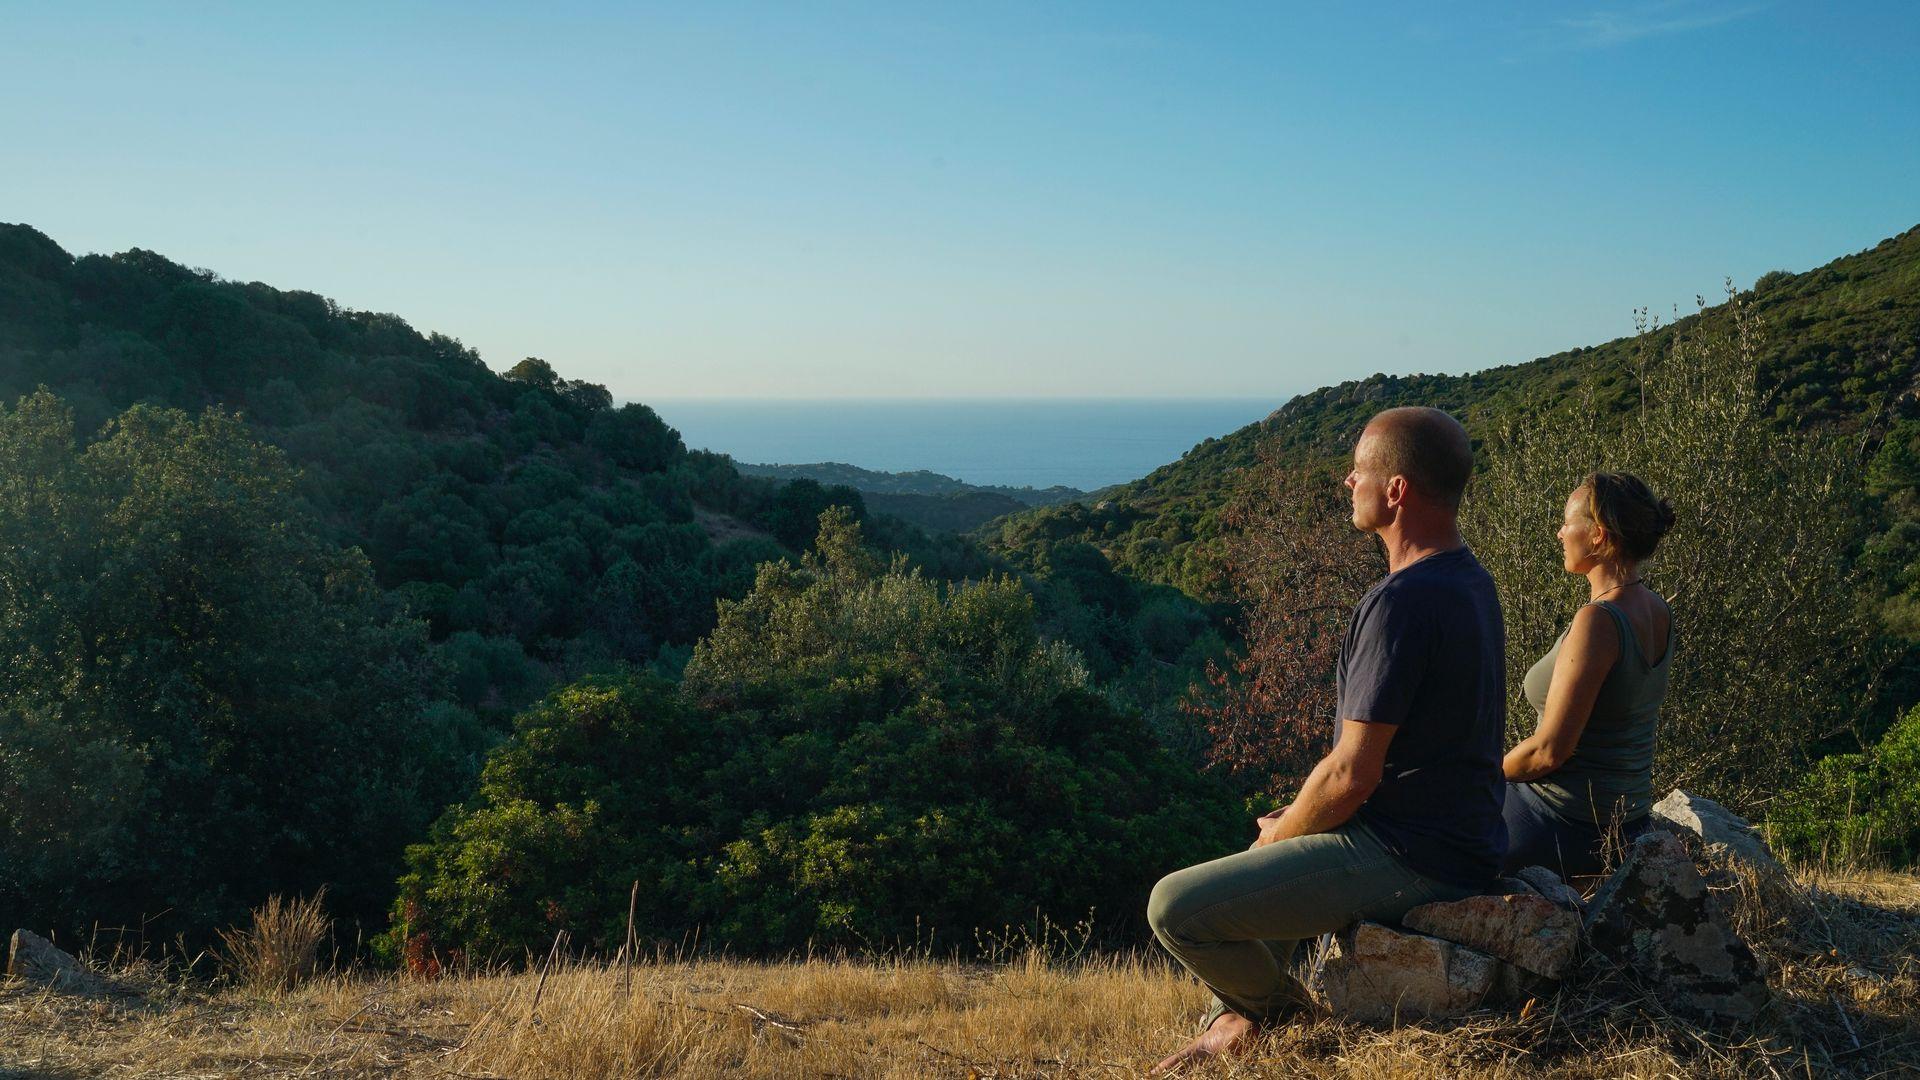 Retreat into nature - header